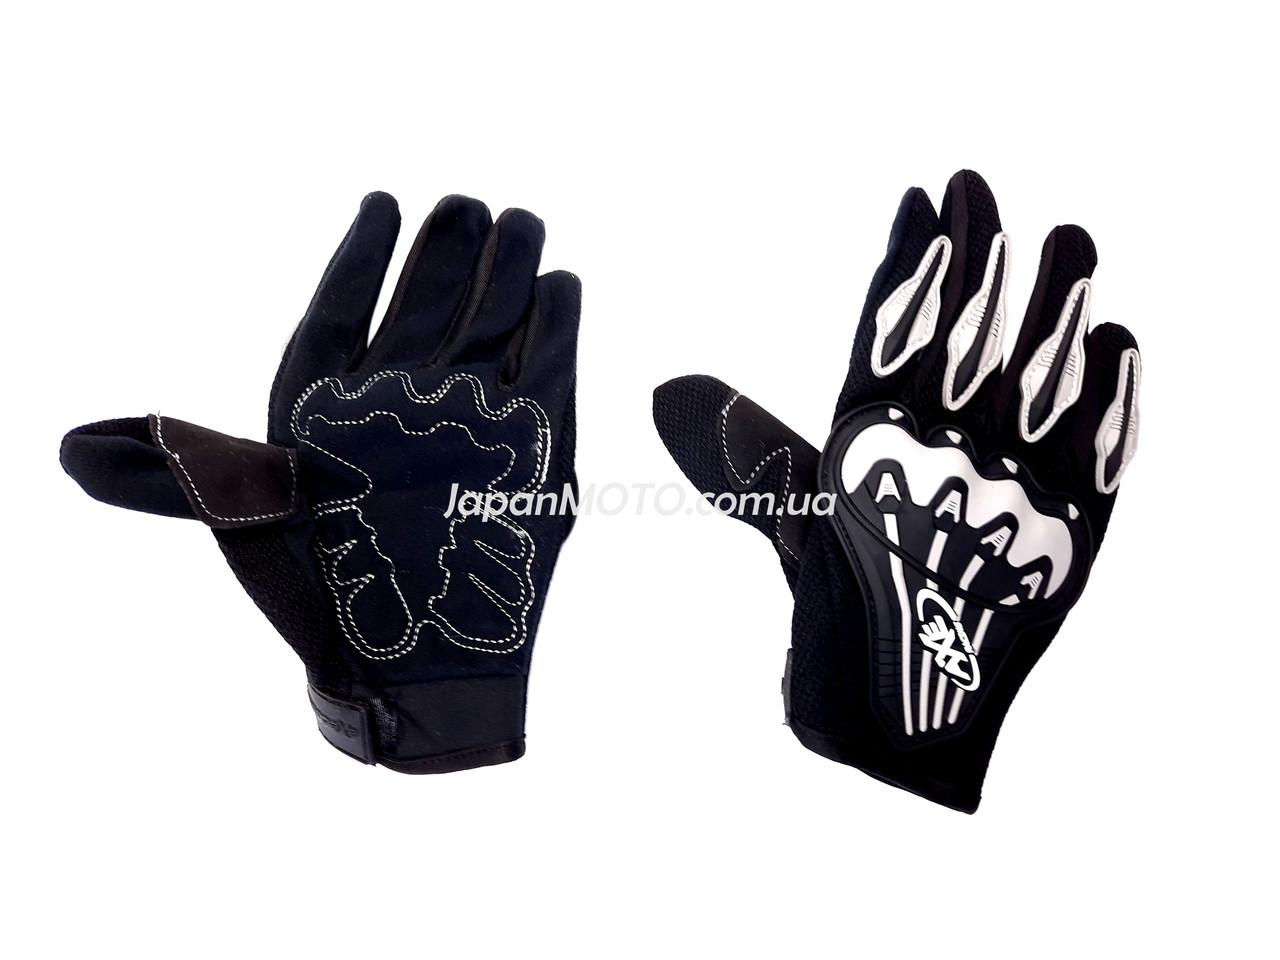 Перчатки AXE RACING ST-07 (size: L, серые)